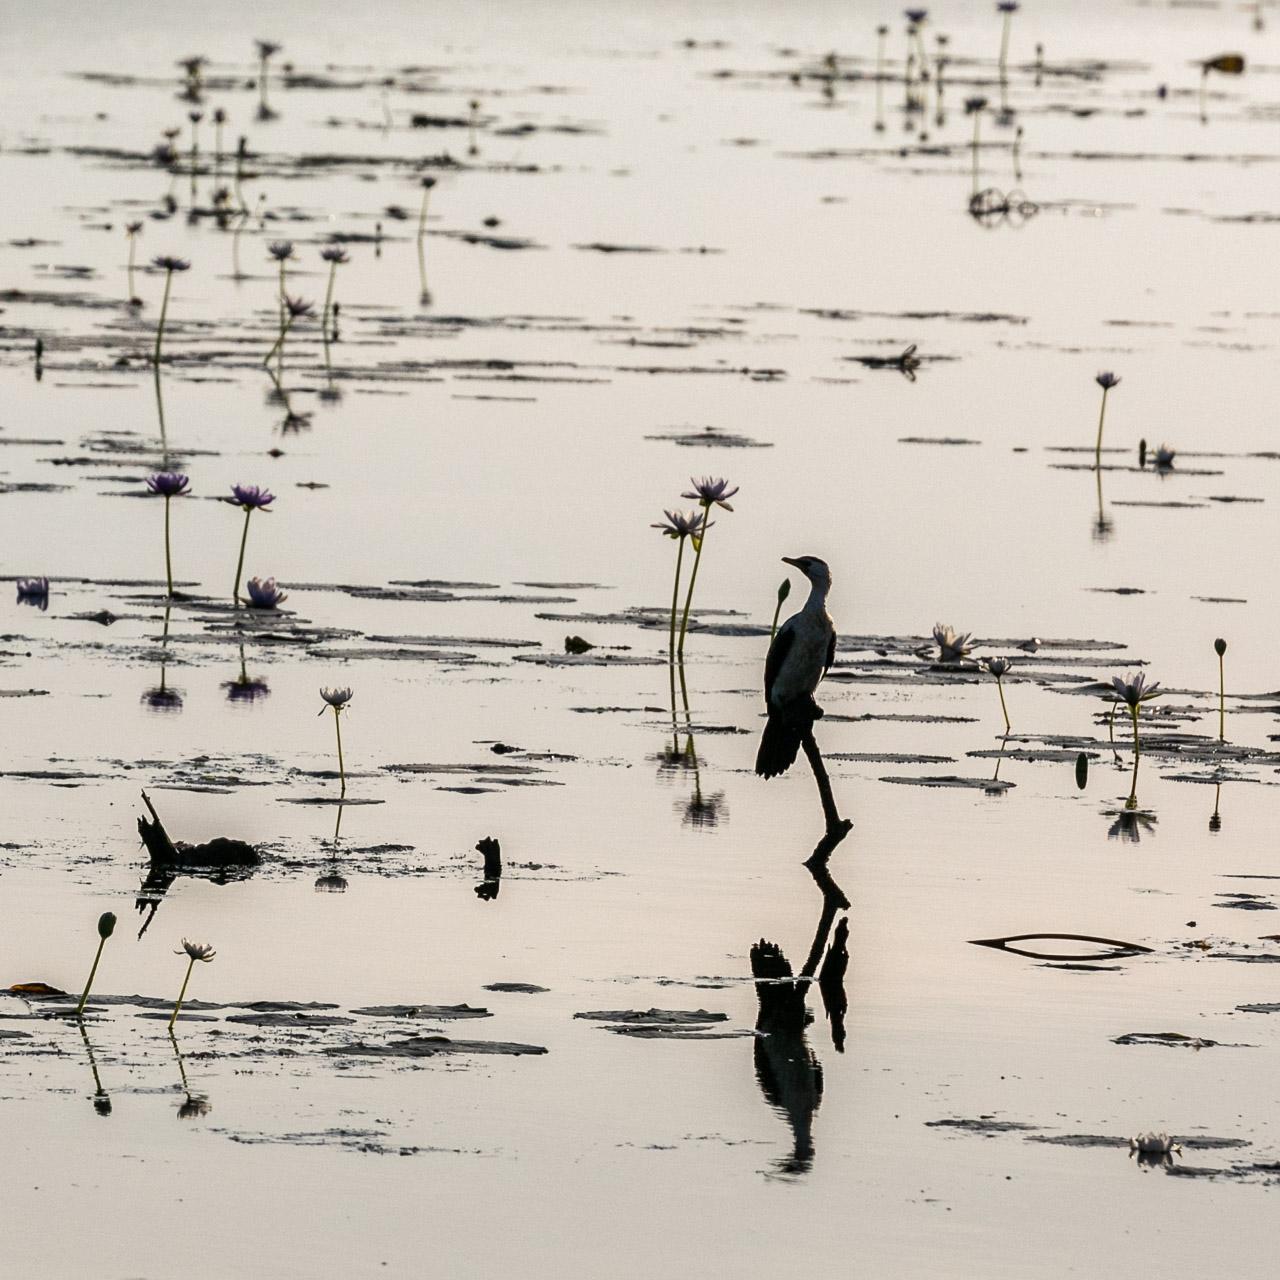 Waterbird and water lilies reflected in Marlgu Billabong, Wyndham